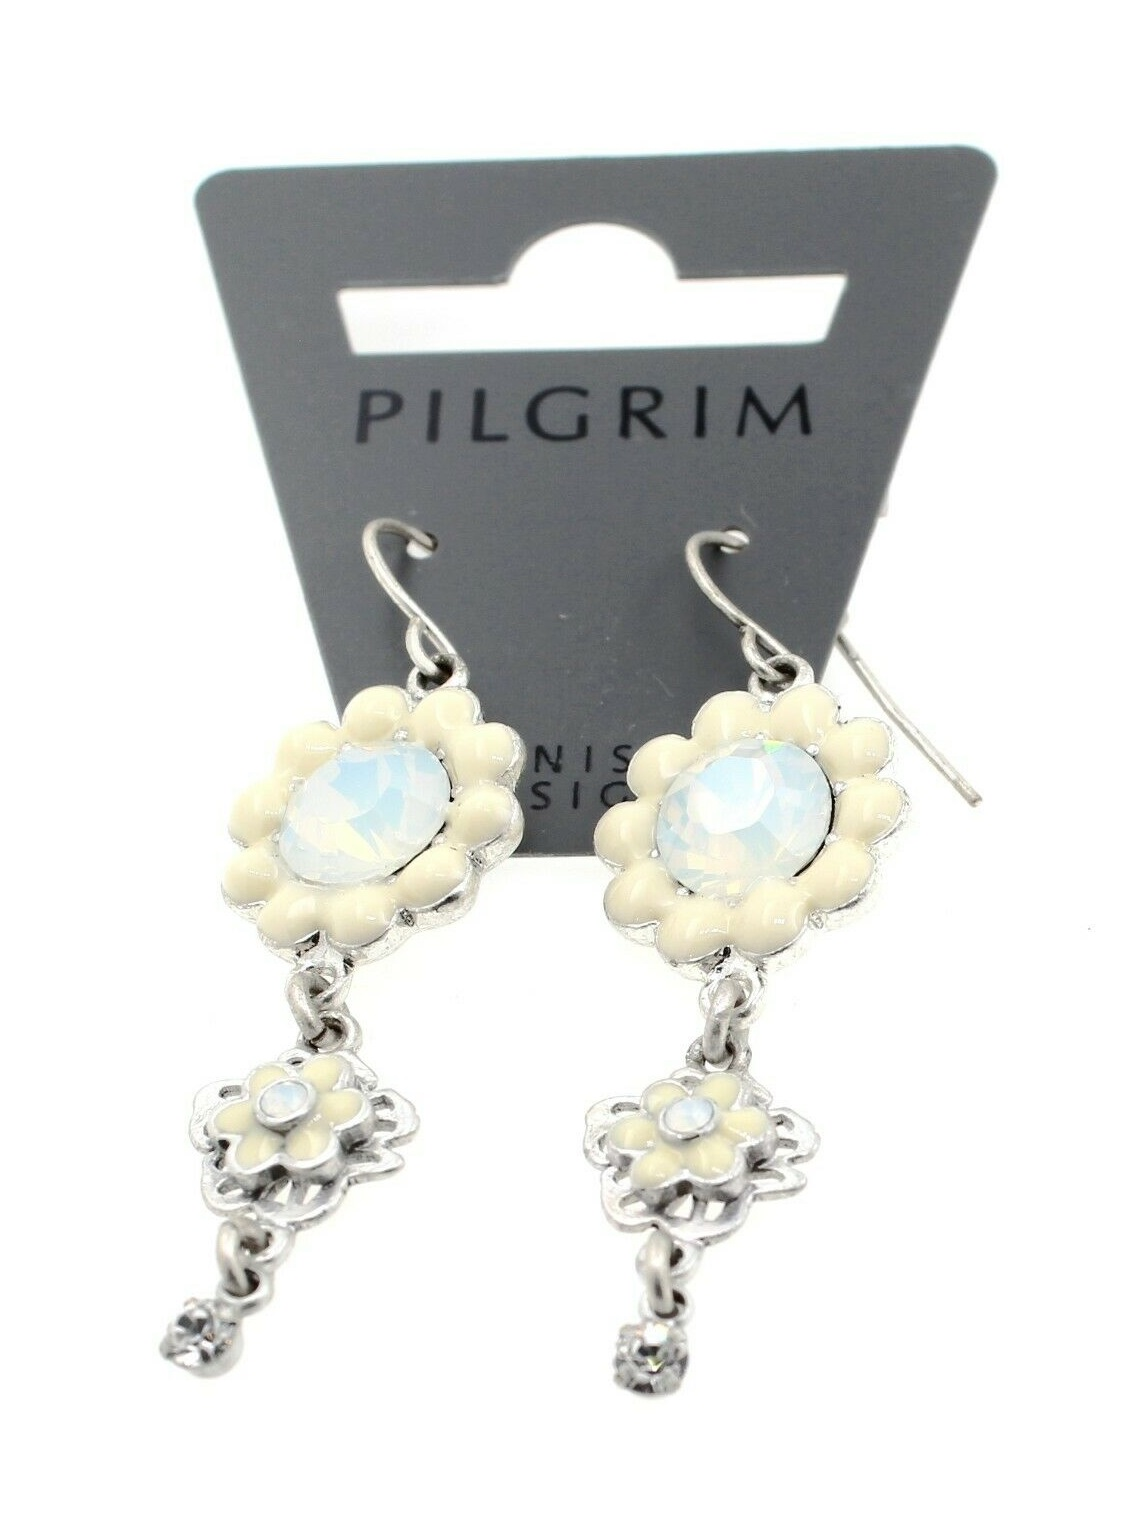 PILGRIM - Flower Two Drop Earrings - Oxidised Silver Plate/White/Cream BNWT